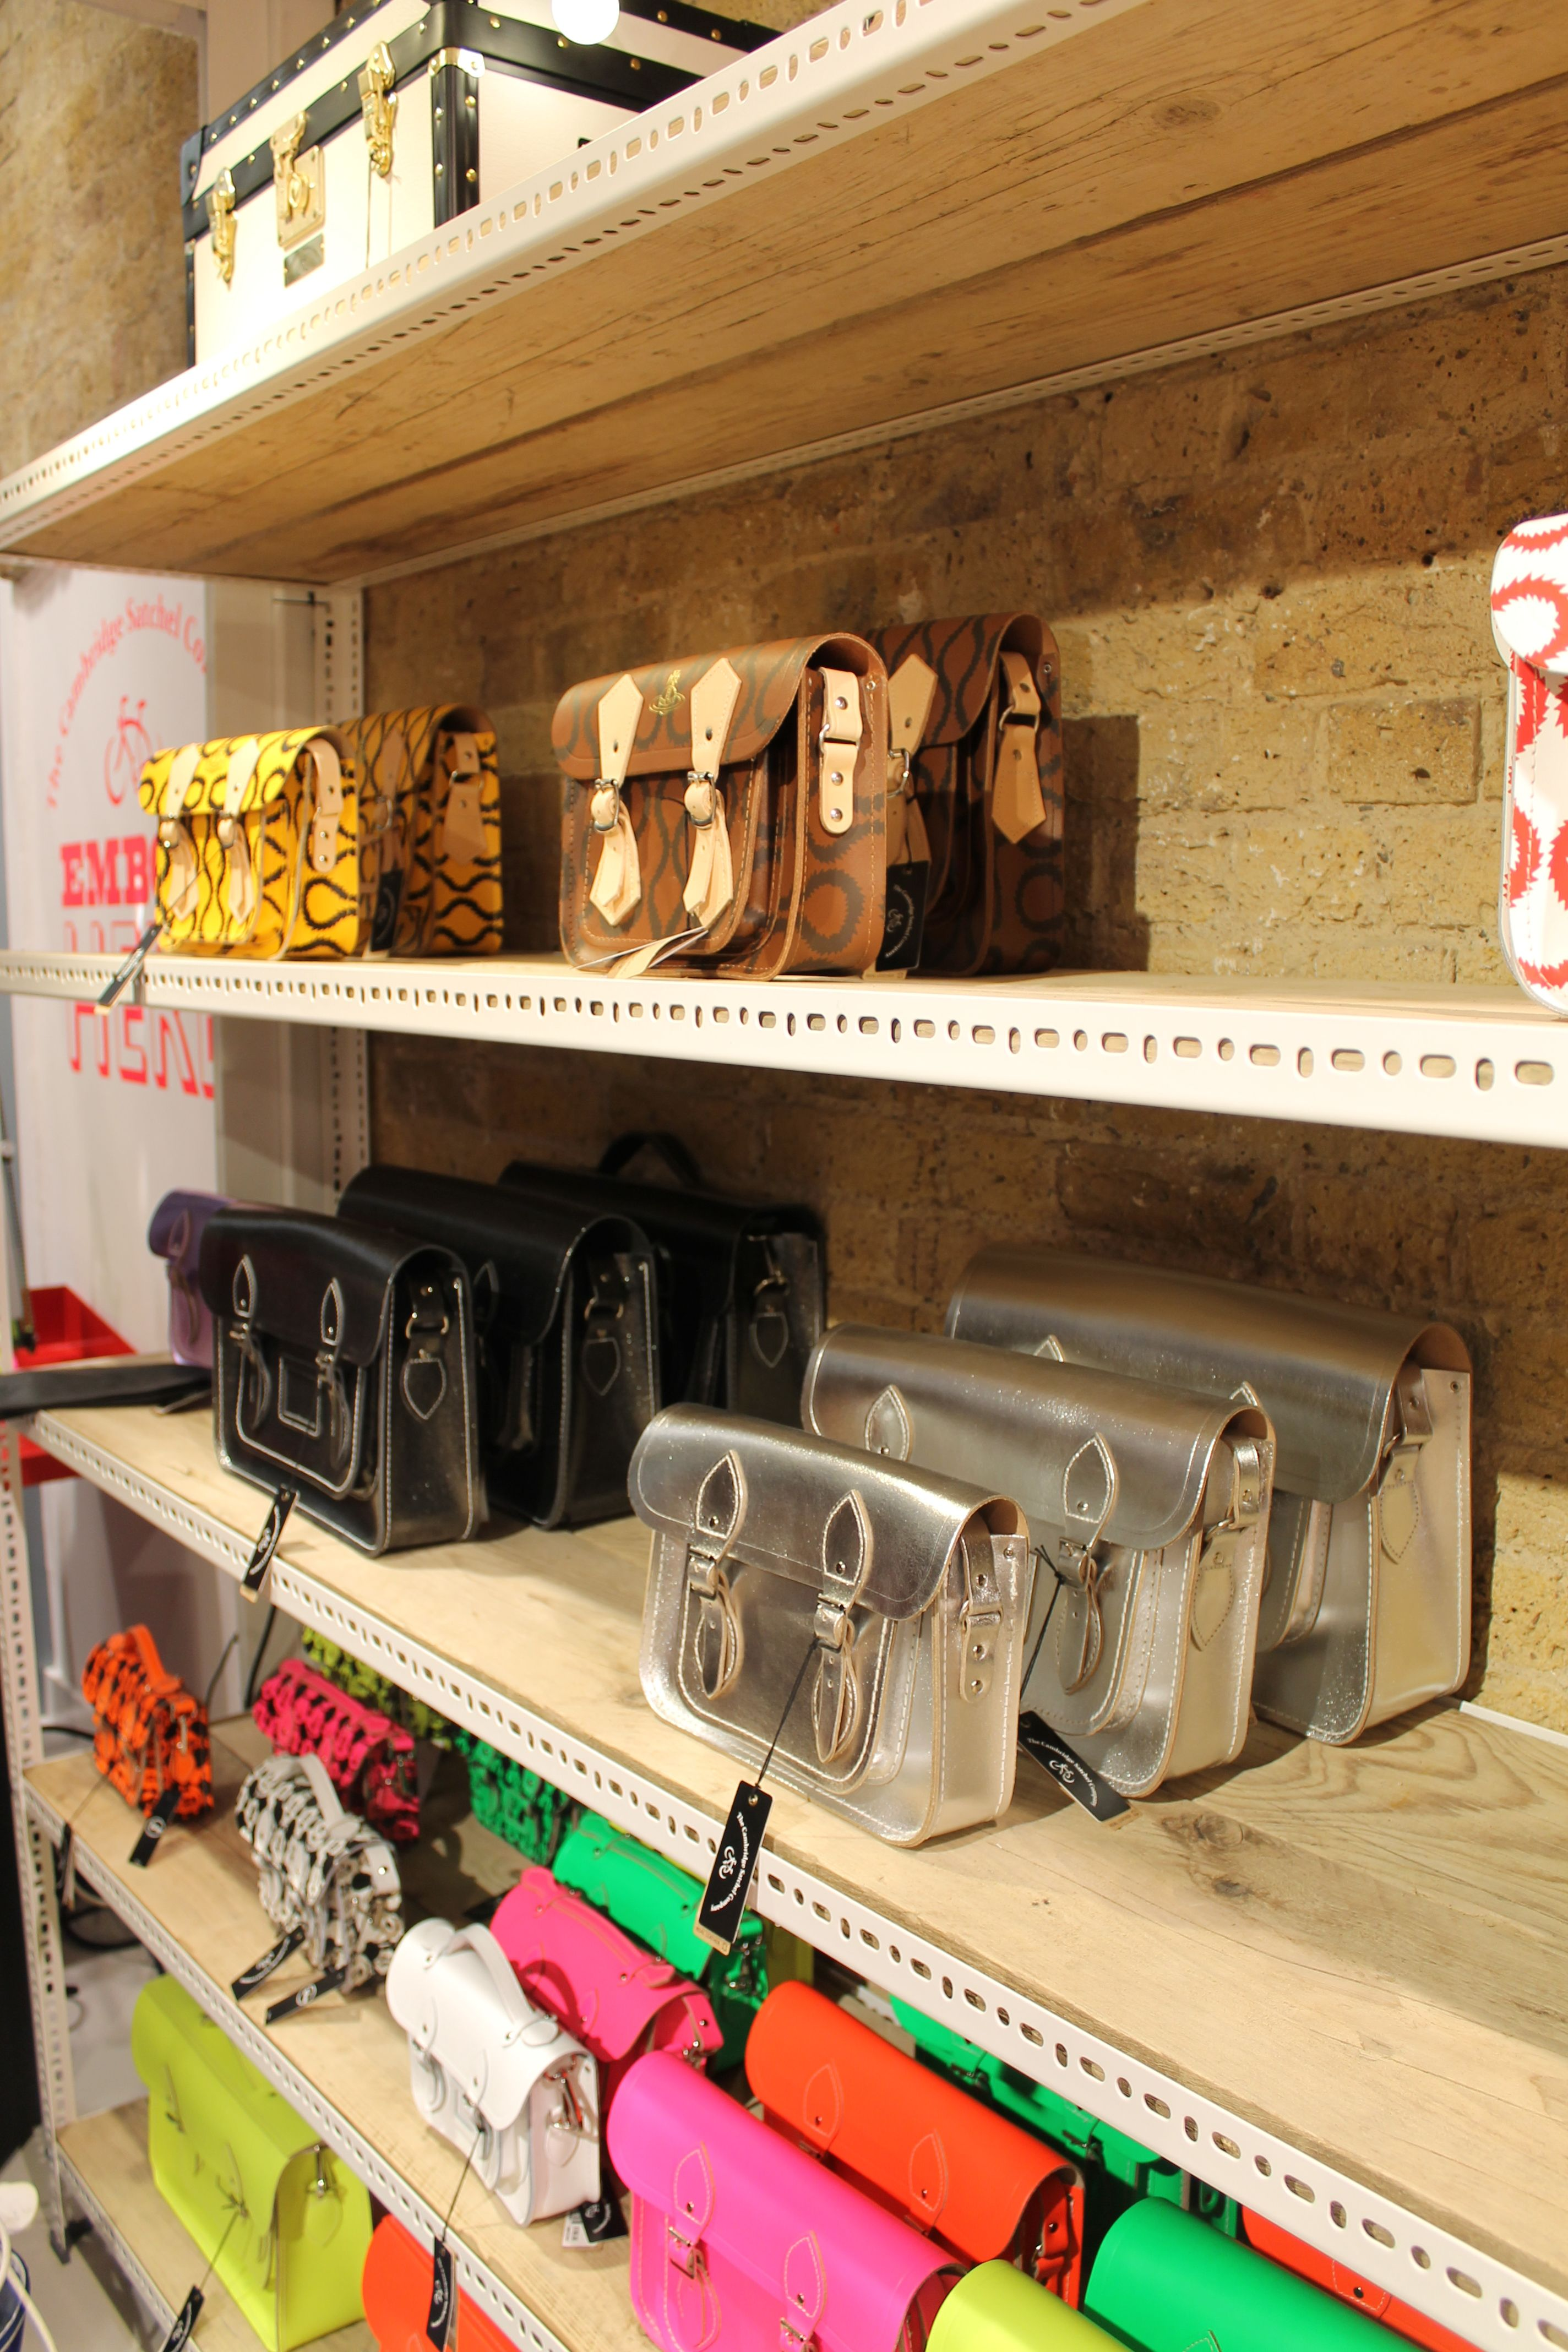 The Cambridge Satchel Company Spitalfields Pop-Up Store